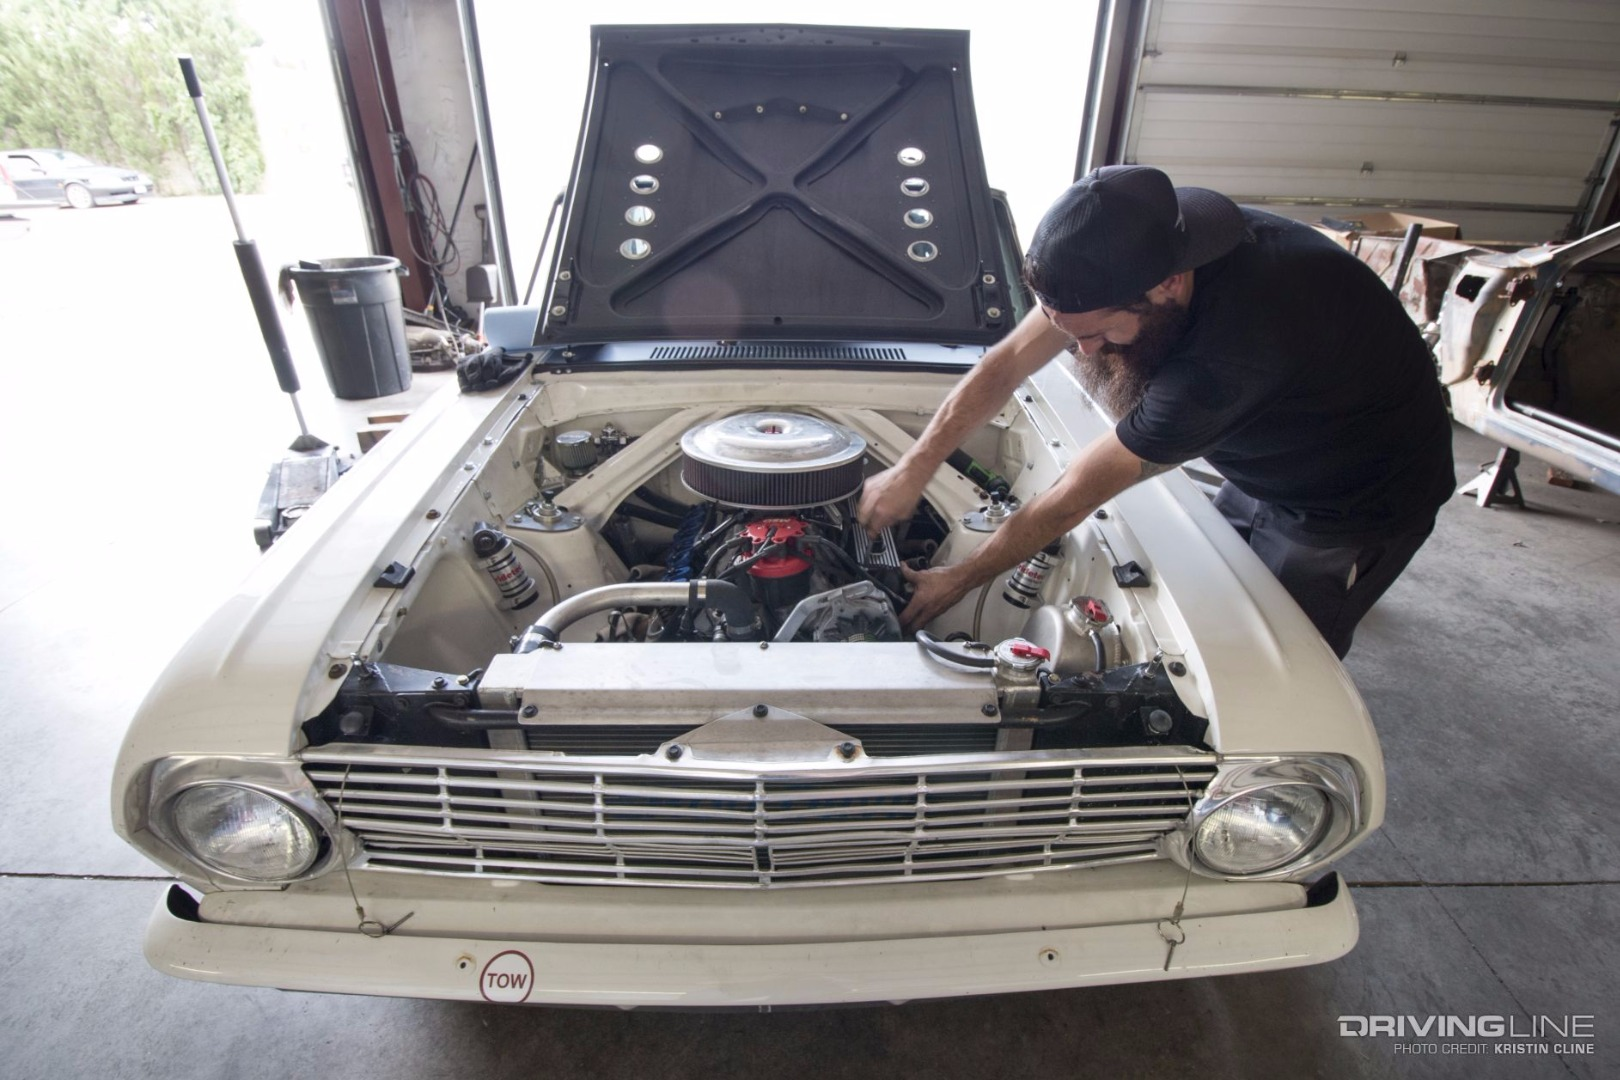 Gas Monkey Garage's Aaron Kaufman Takes on Pike's Peak in His 1963